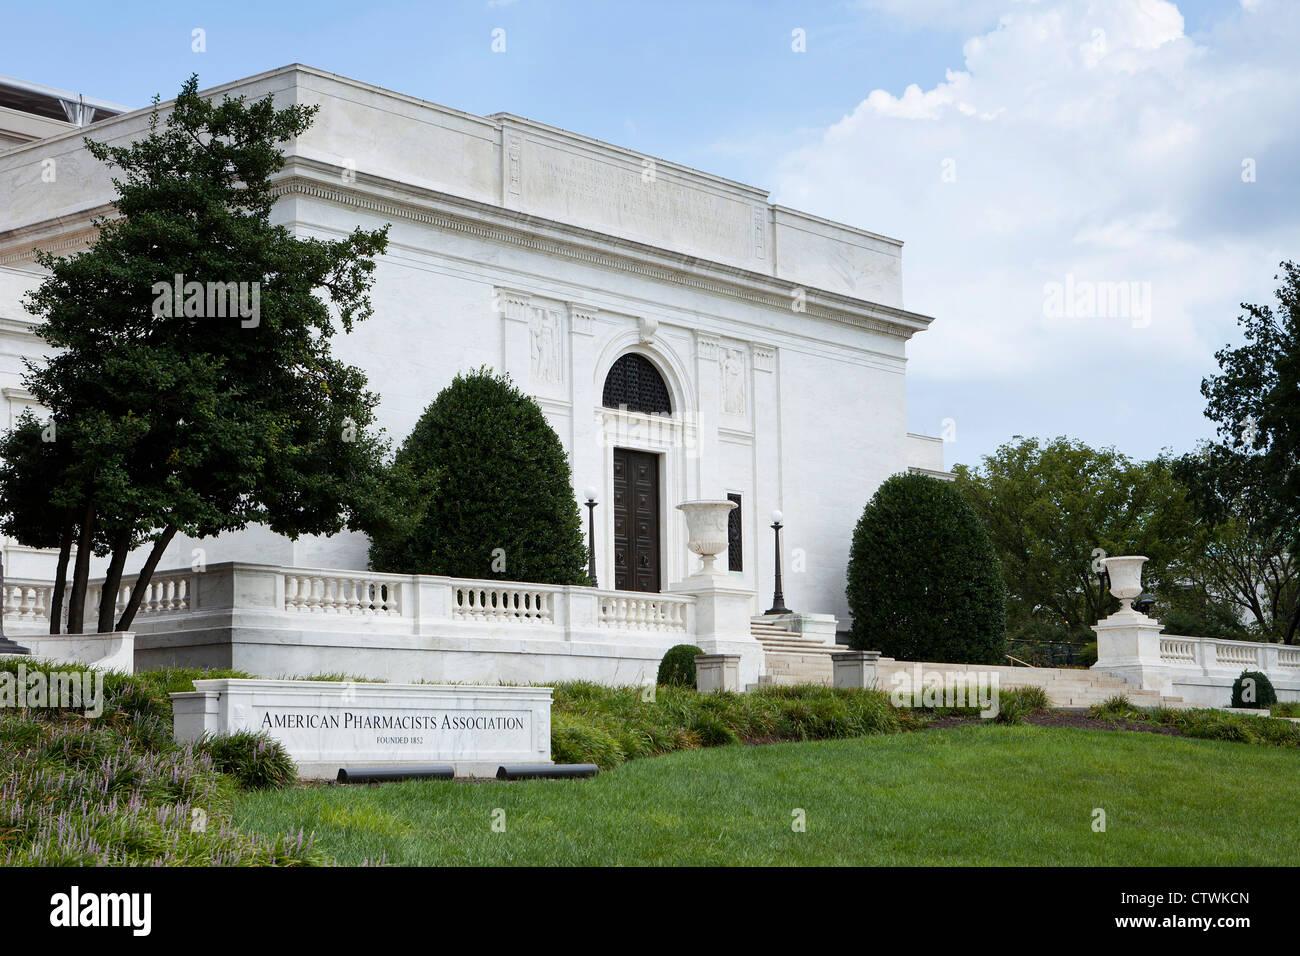 The American Pharmacists Association, Washington, DC - Stock Image